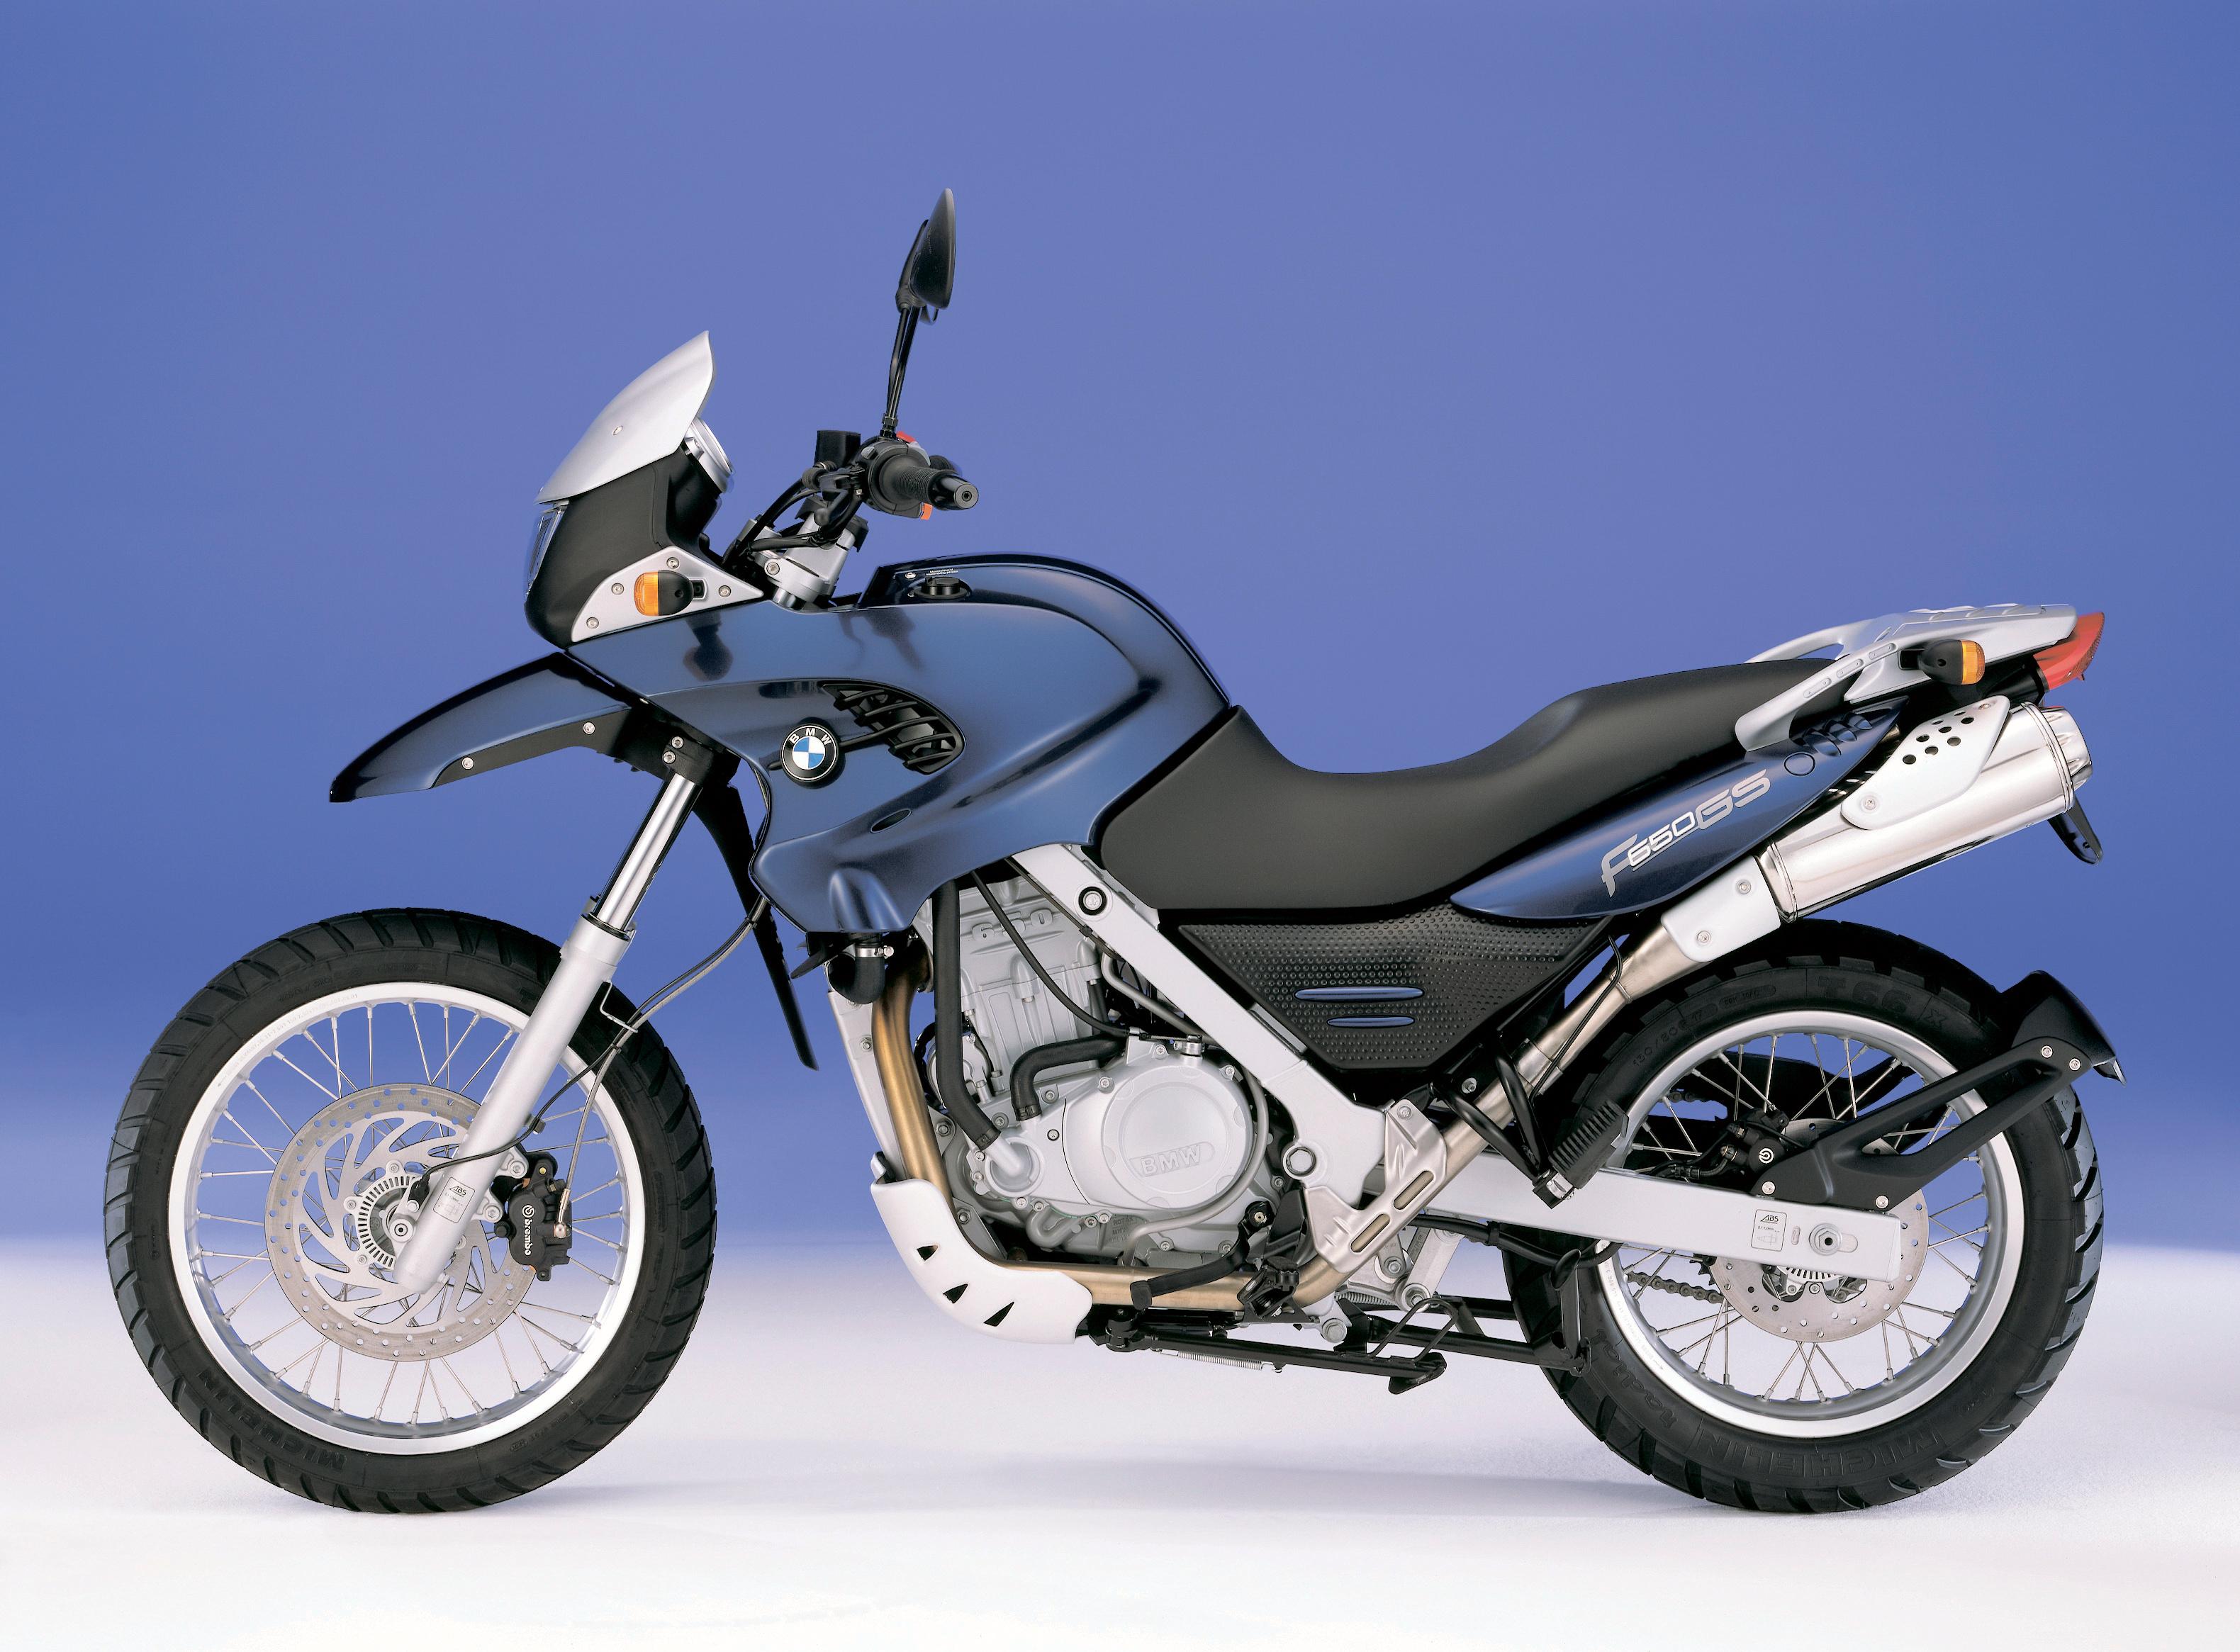 Фото БМВ F 650 GS (R13), 1999–2003 Мотоциклы Сбоку BMW - Мотоциклы мотоцикл